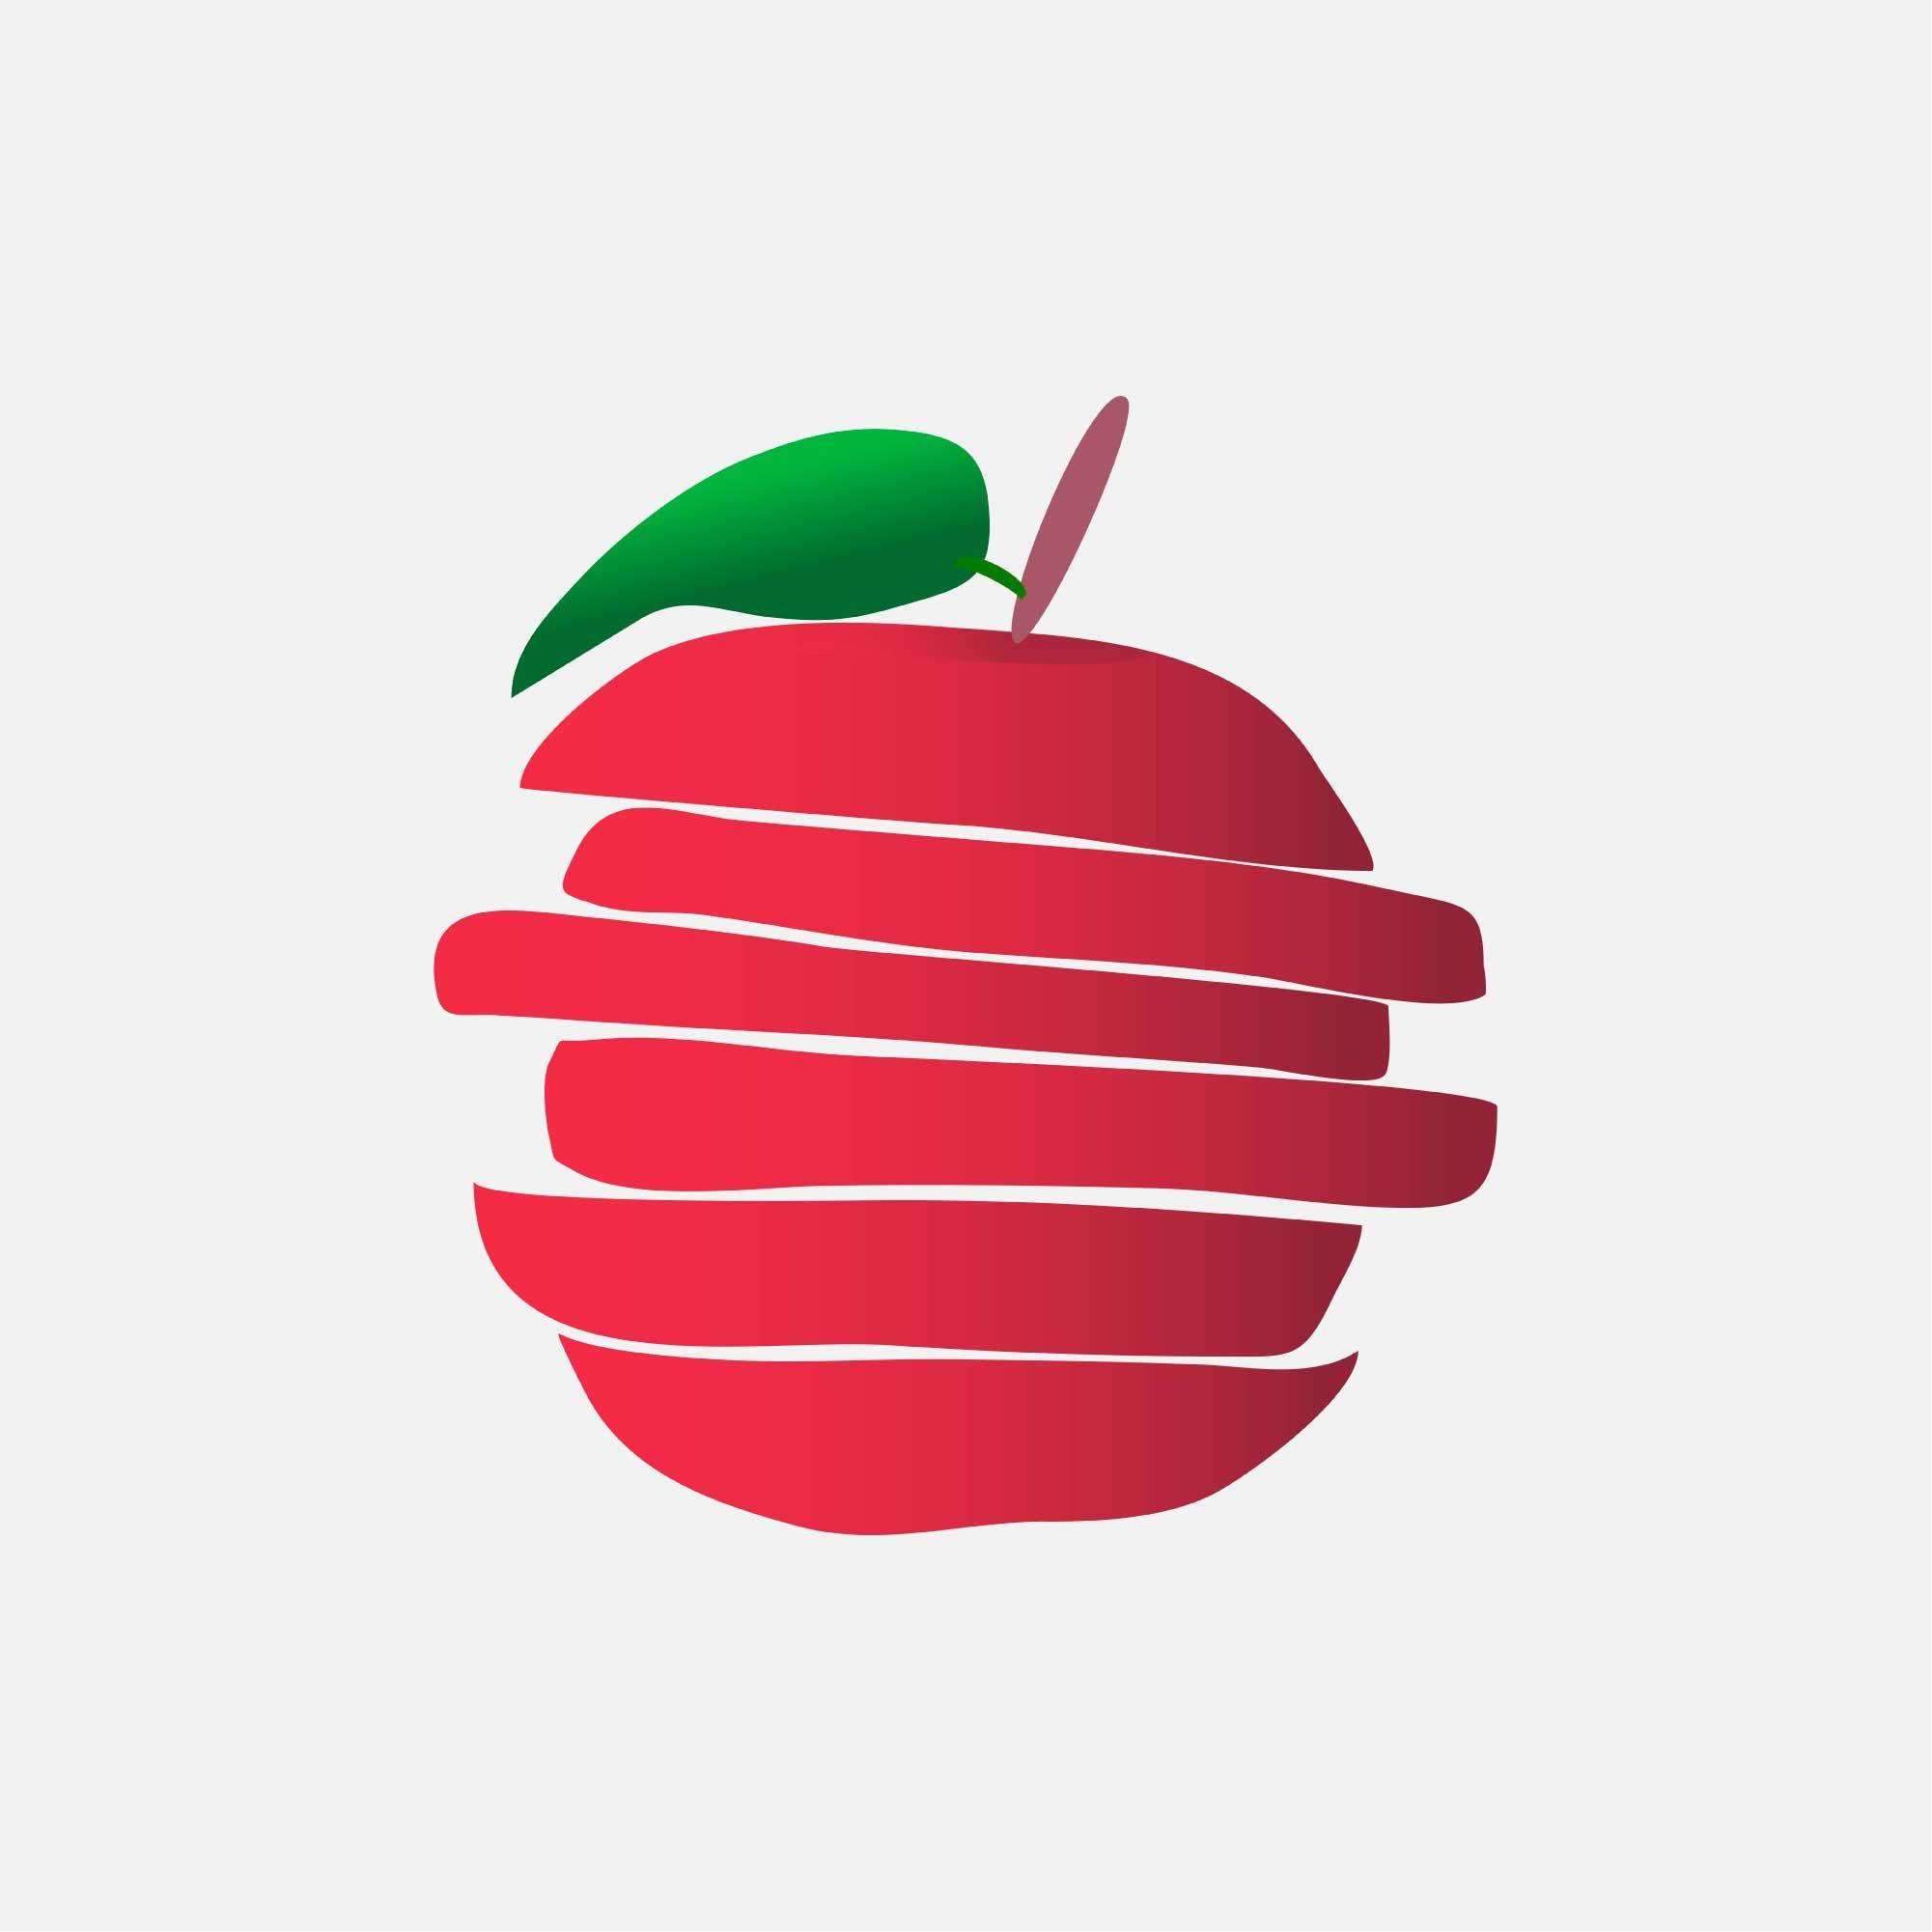 Abstract Apple I 2020